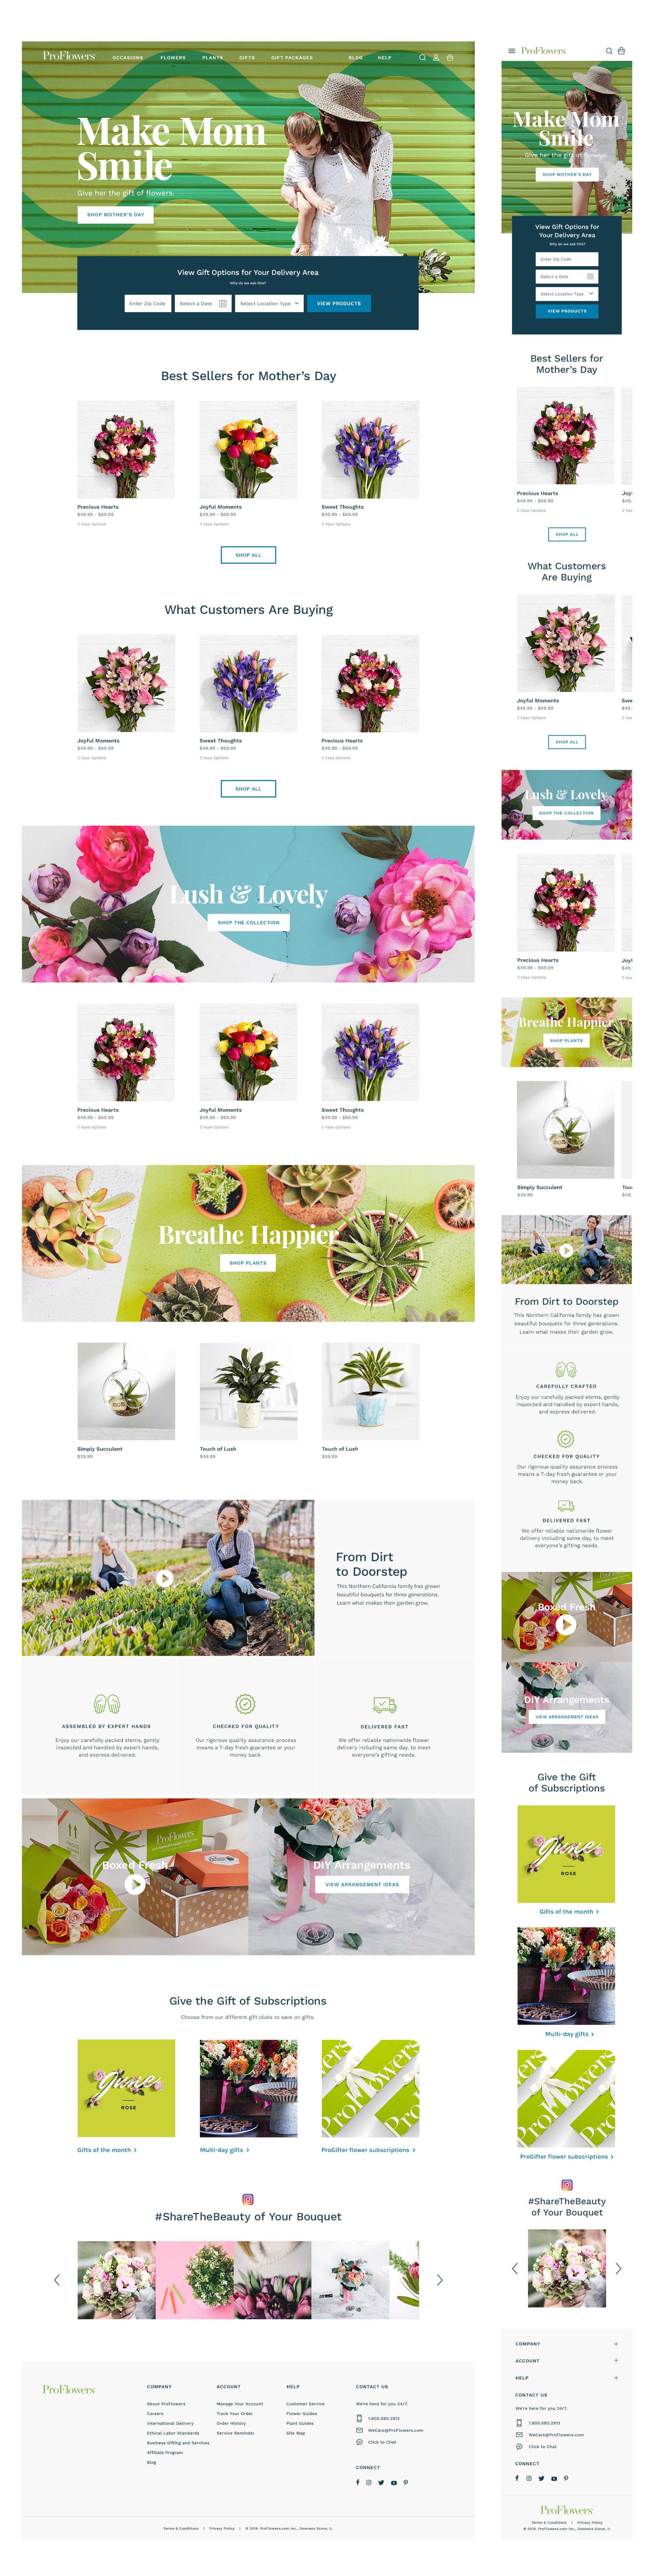 ProFlowers Homepage